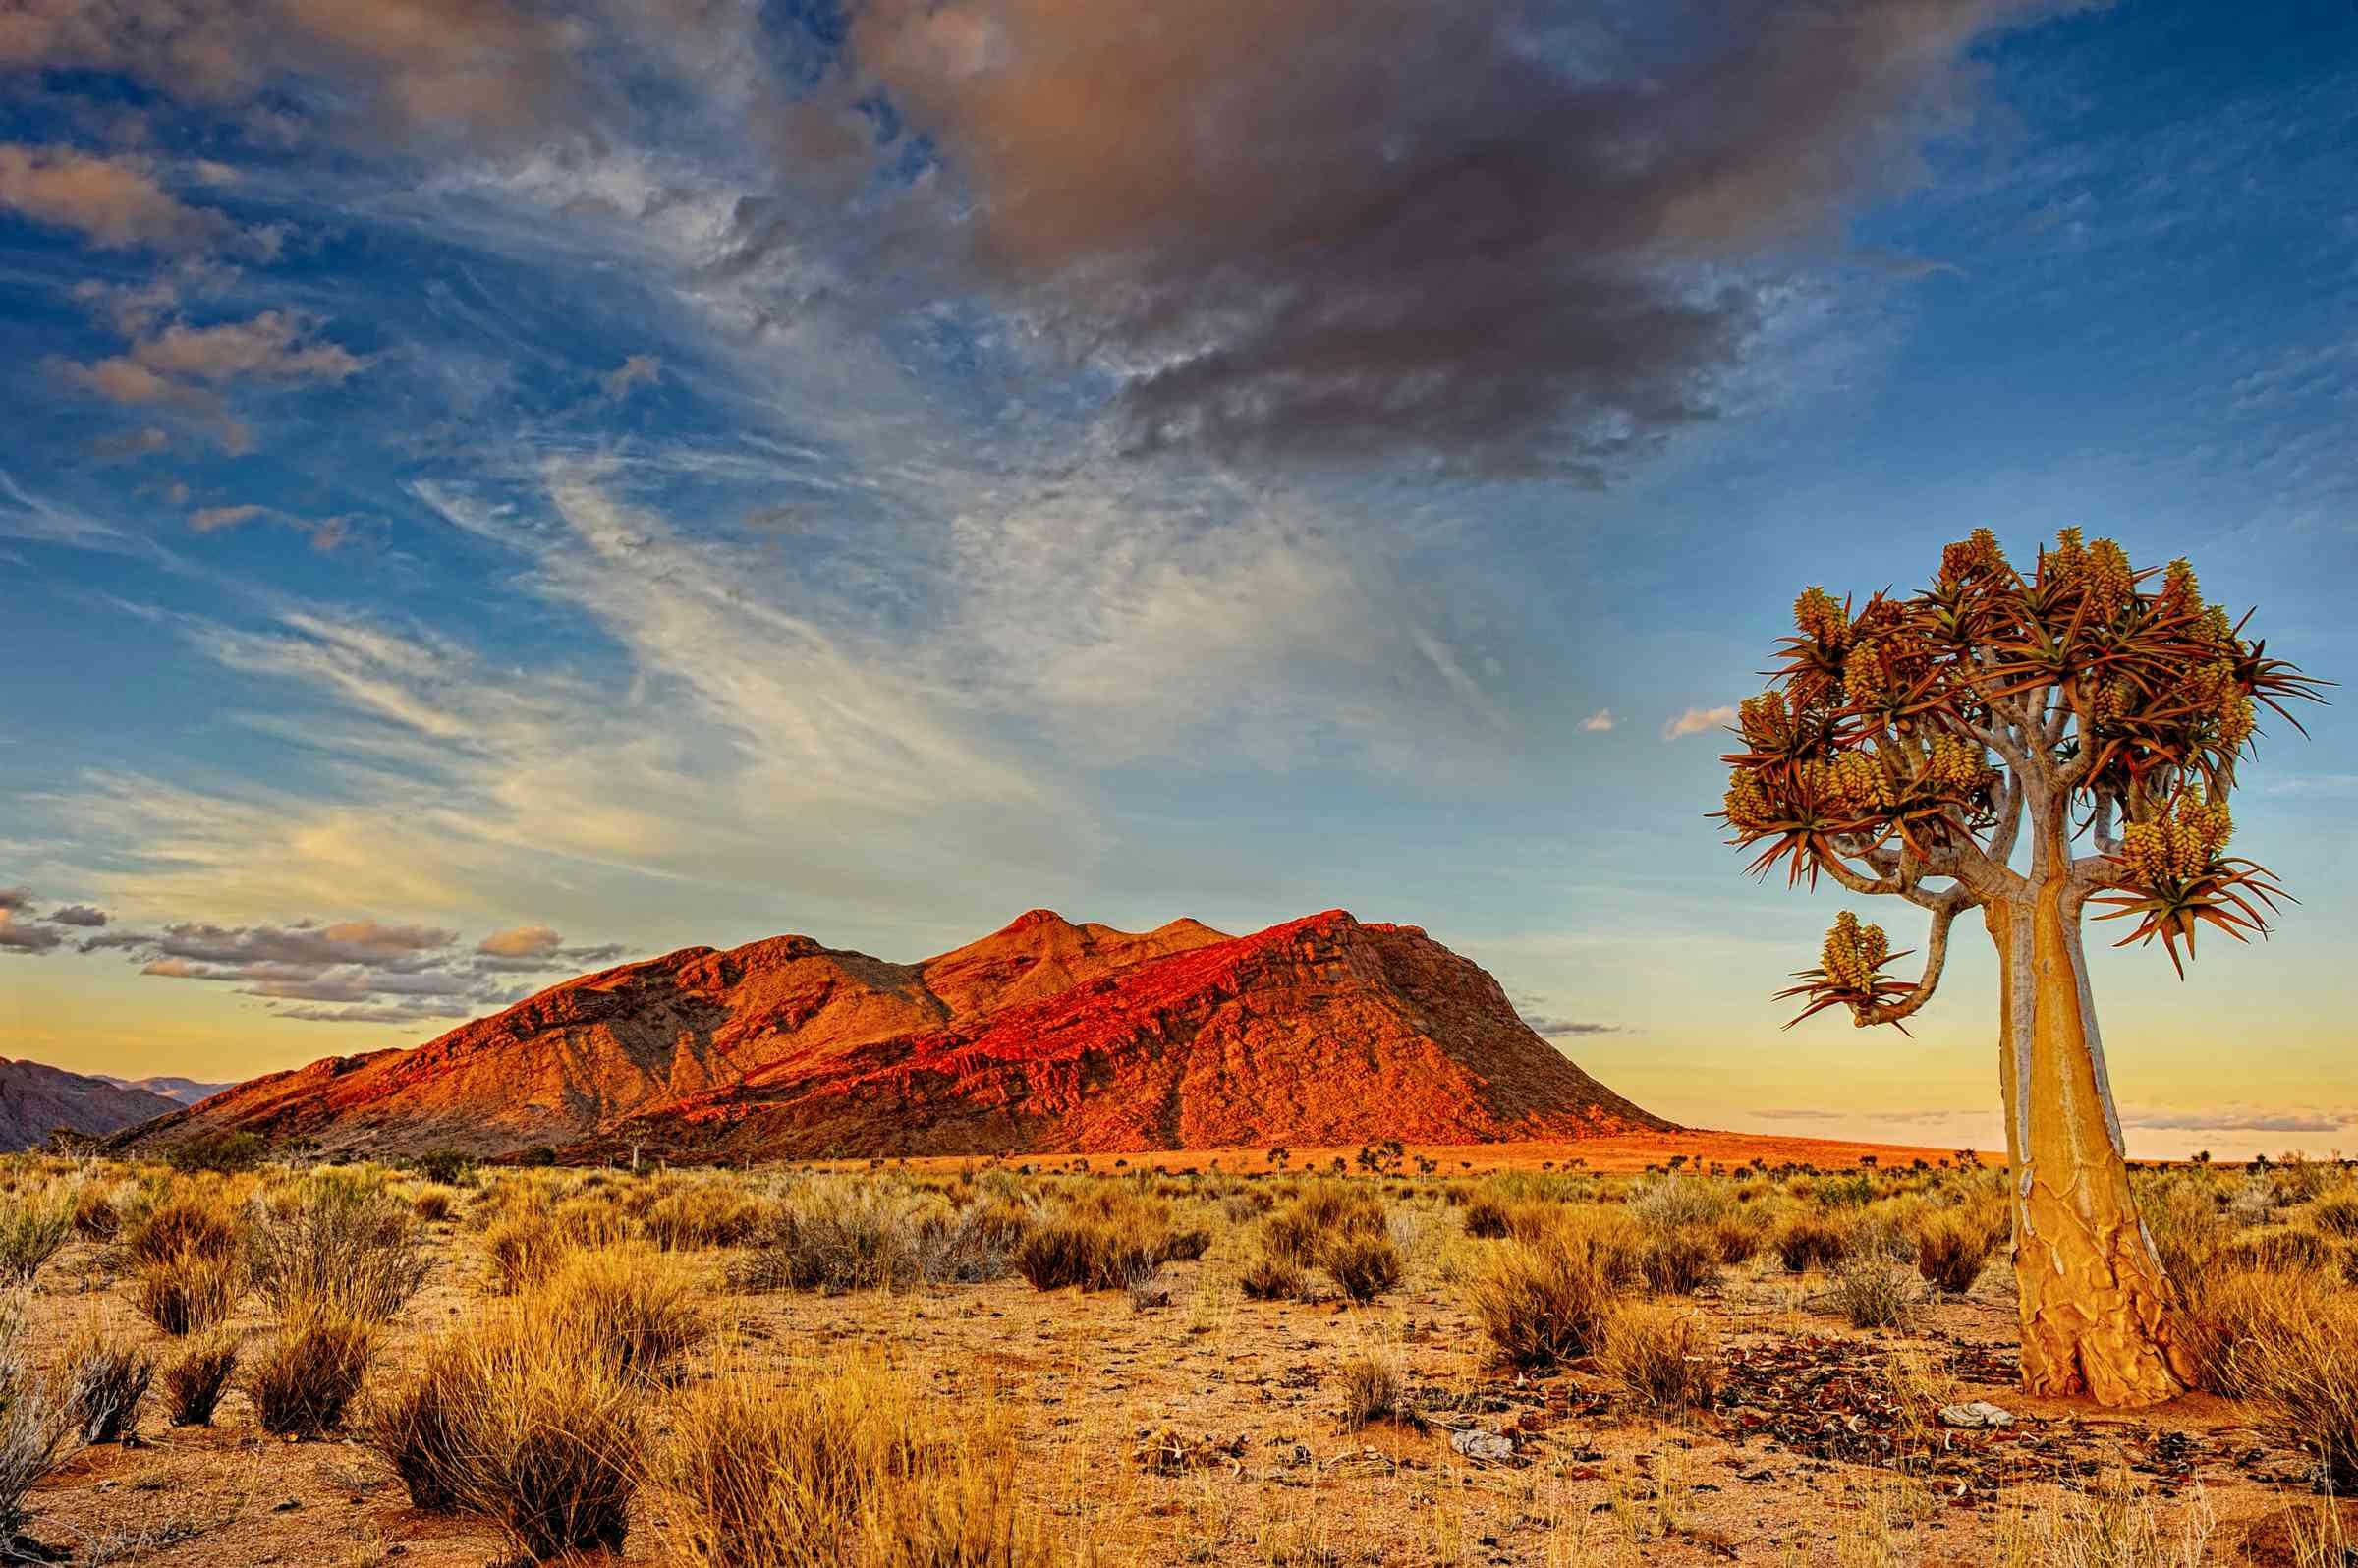 Quiver tree and red mountain in Kalahari Desert at dusk